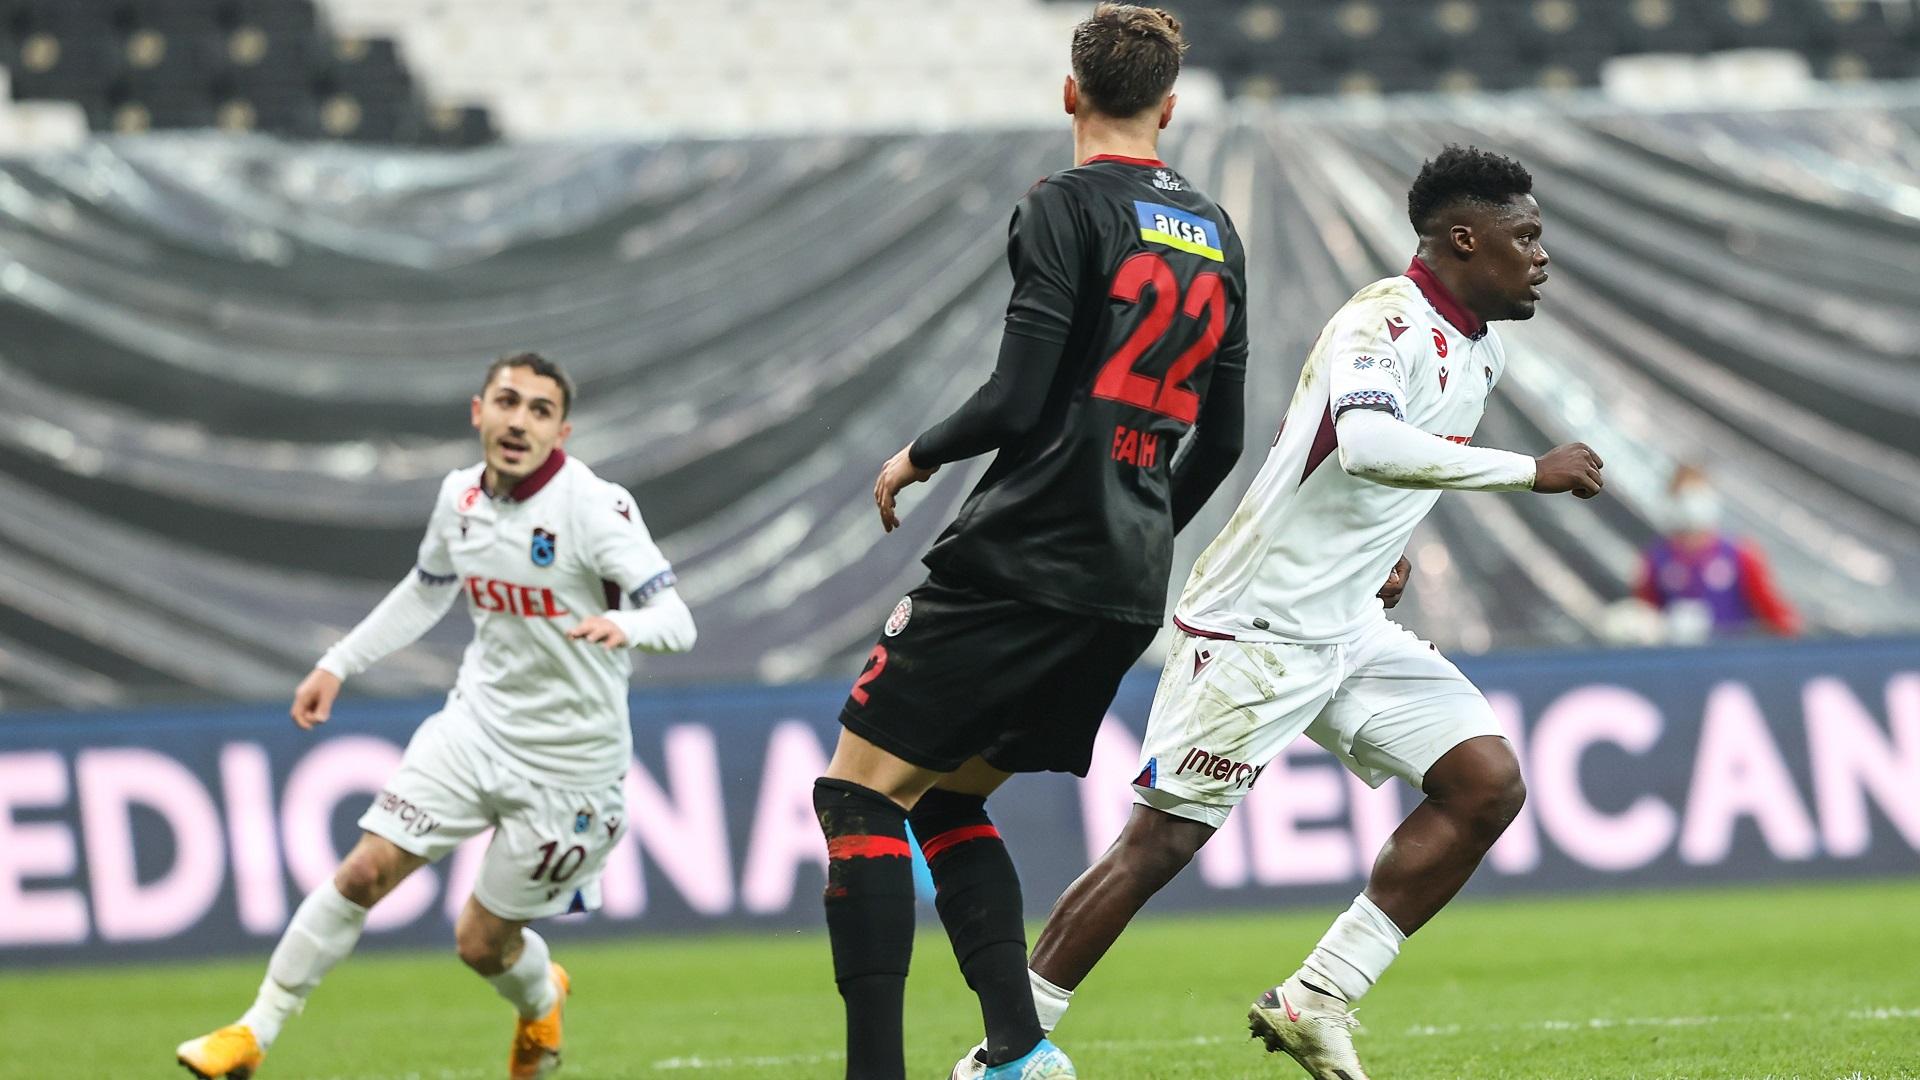 Opta maç sonu notları: Fatih Karagümrük - Trabzonspor